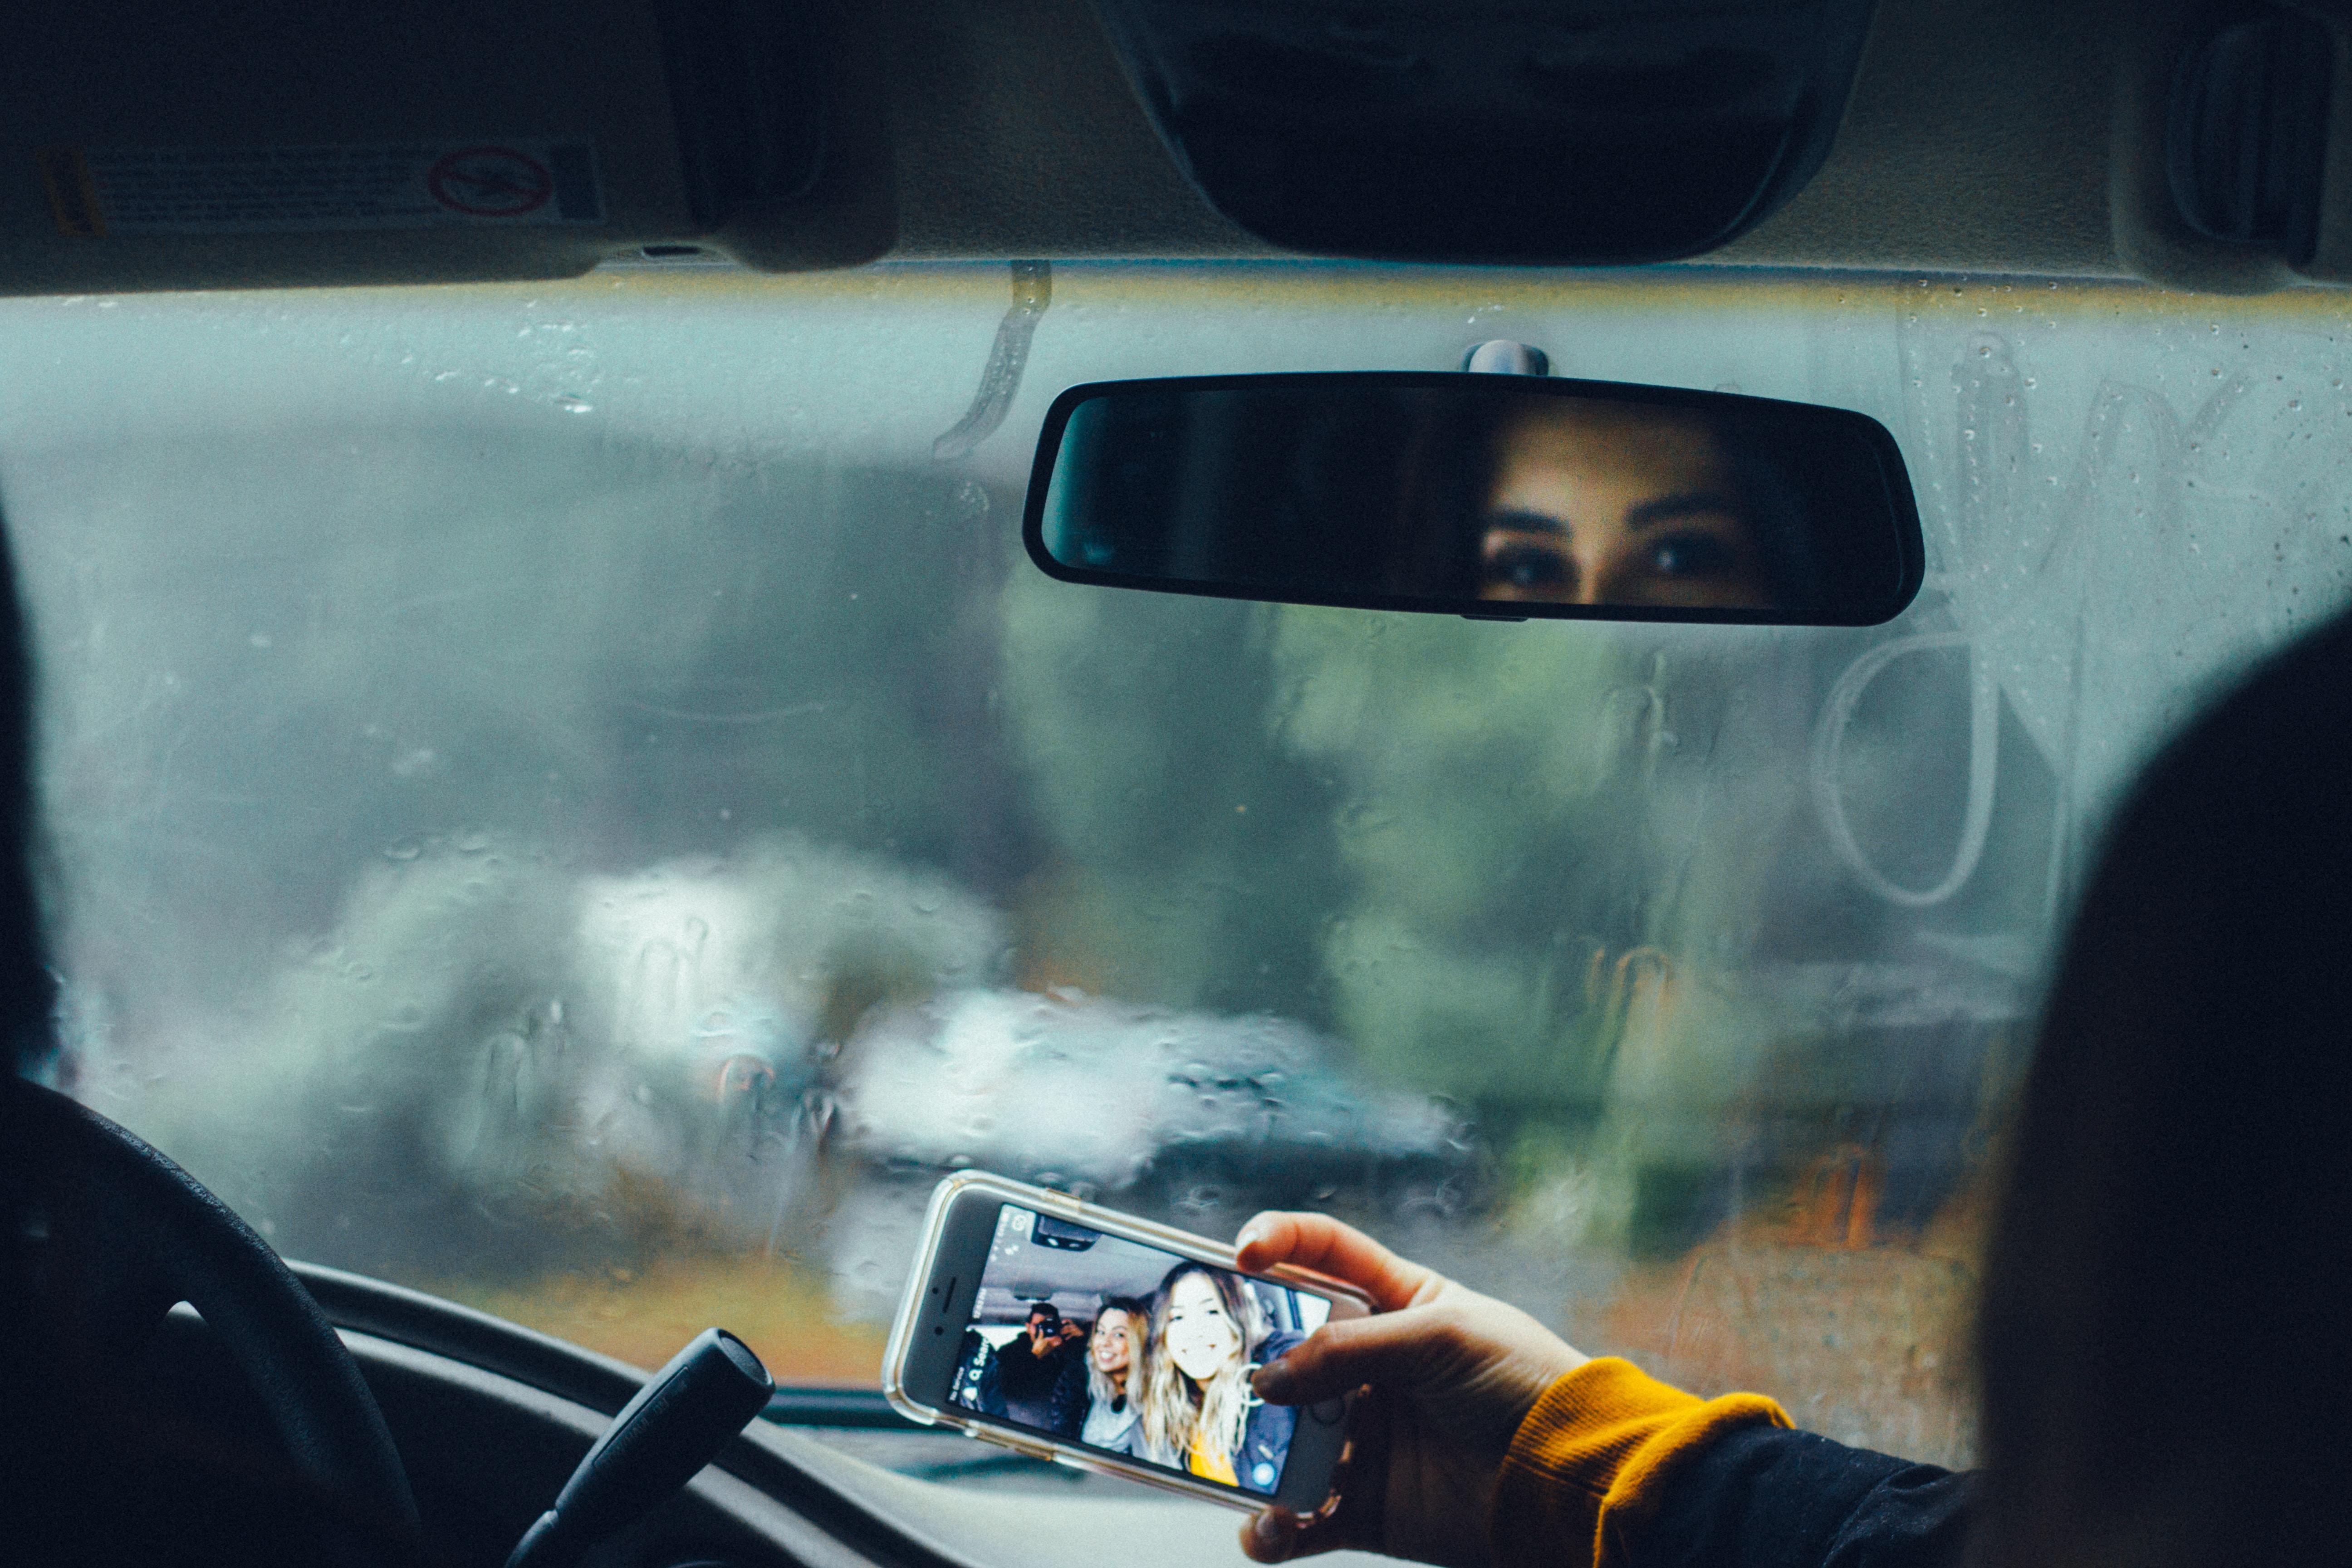 person walking photo inside vehicle